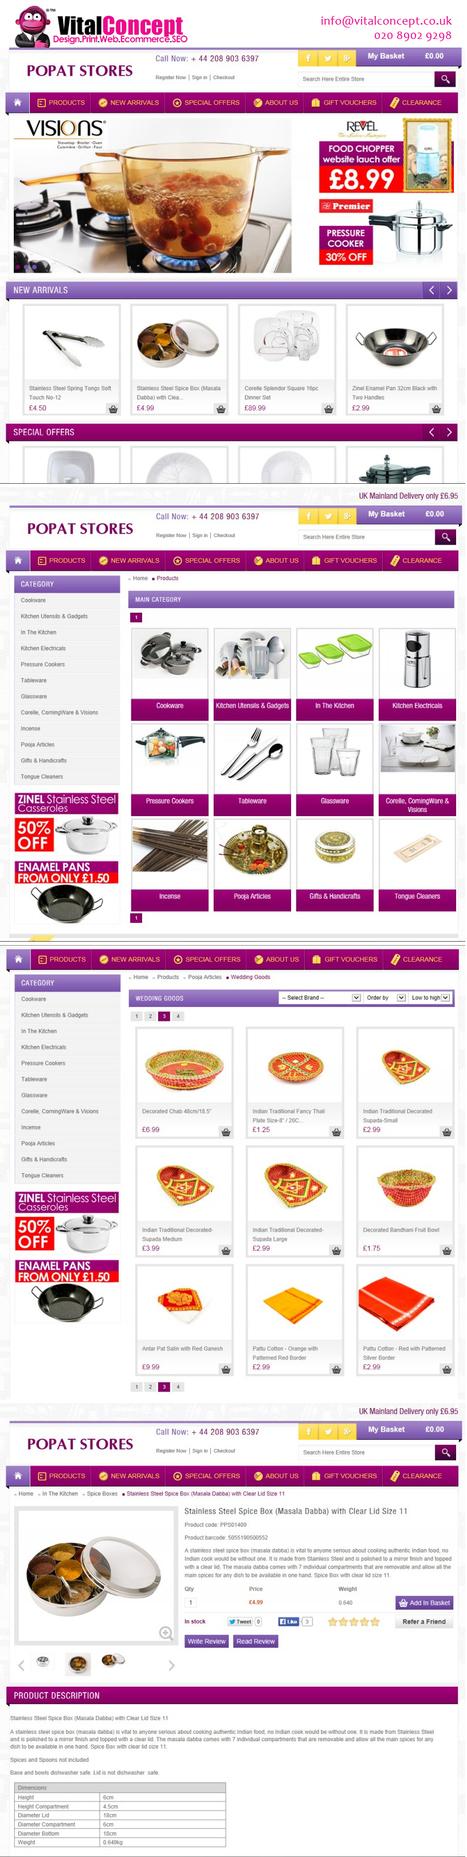 Wordpress Web Design & Development Services in London | Digital Marketing Tips - SEO | SMO | PPC | Scoop.it